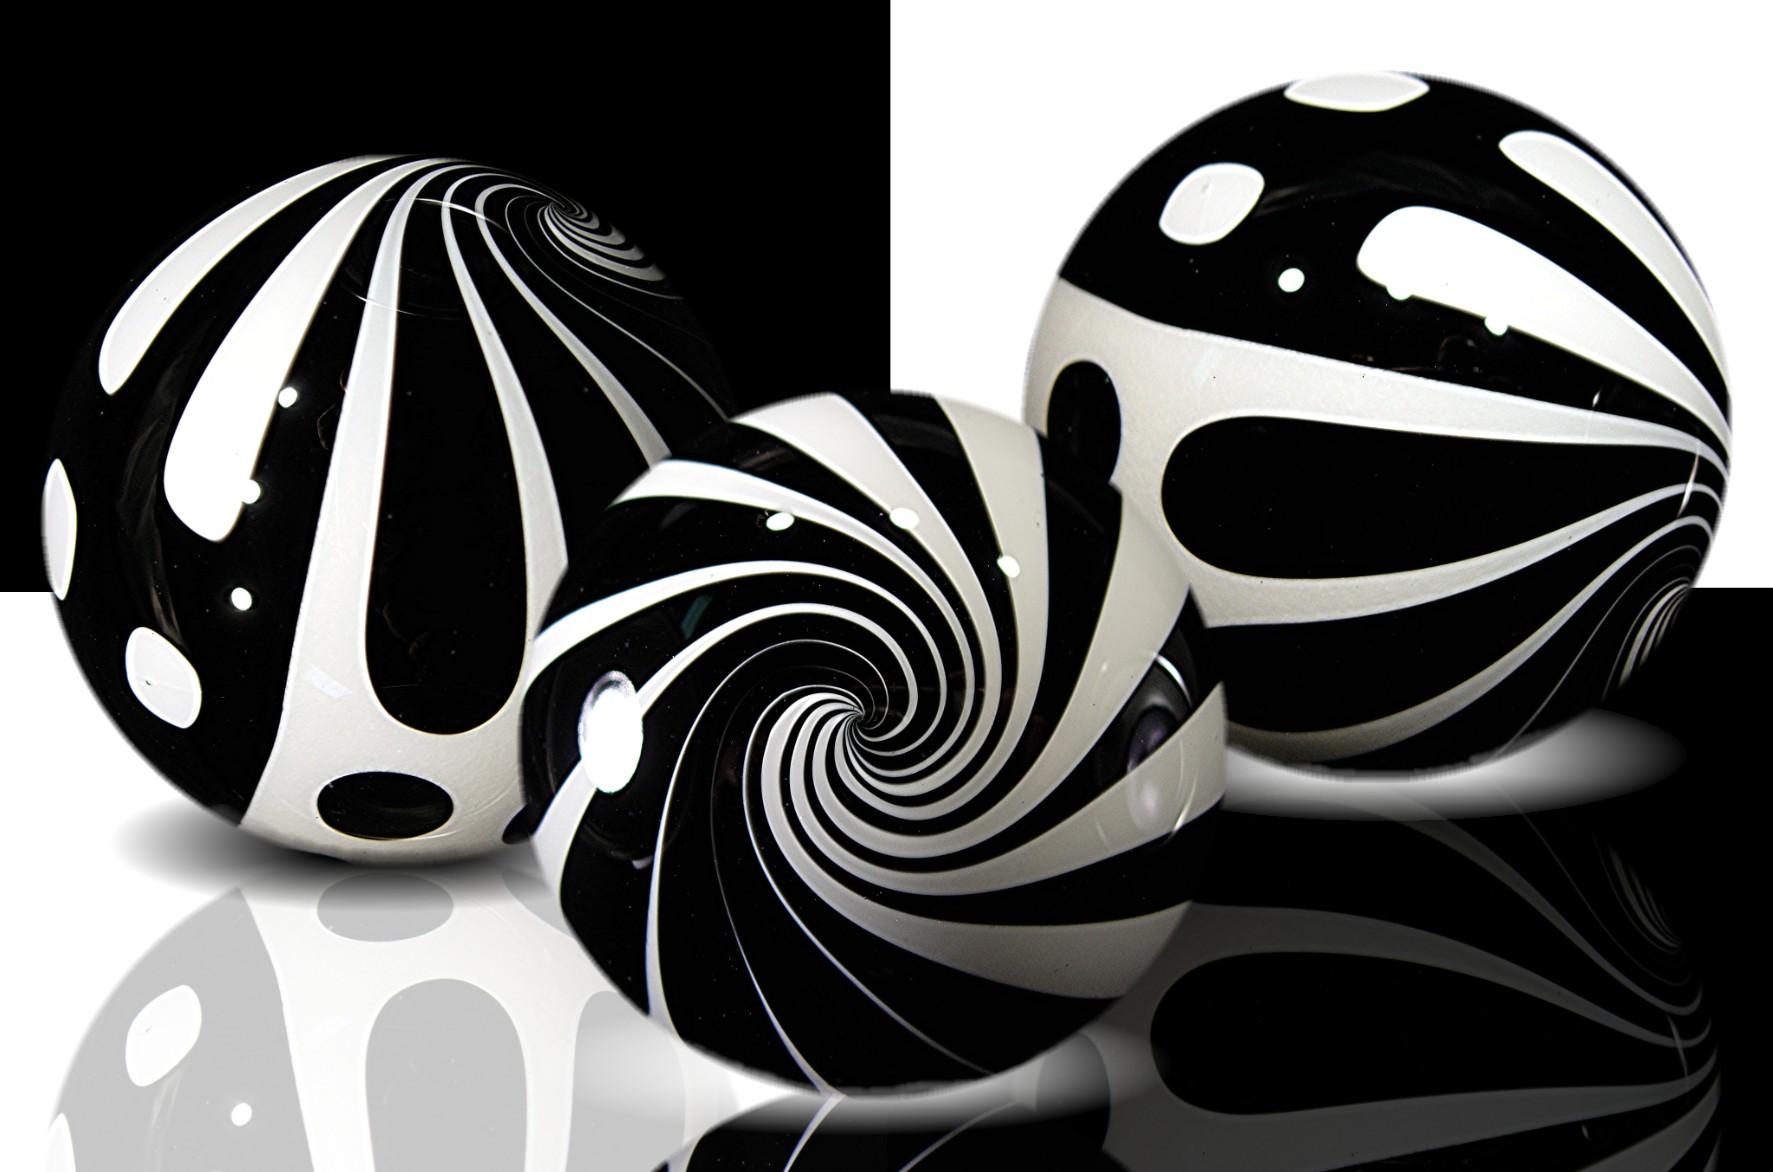 HQ Black & White Wallpapers | File 245.56Kb